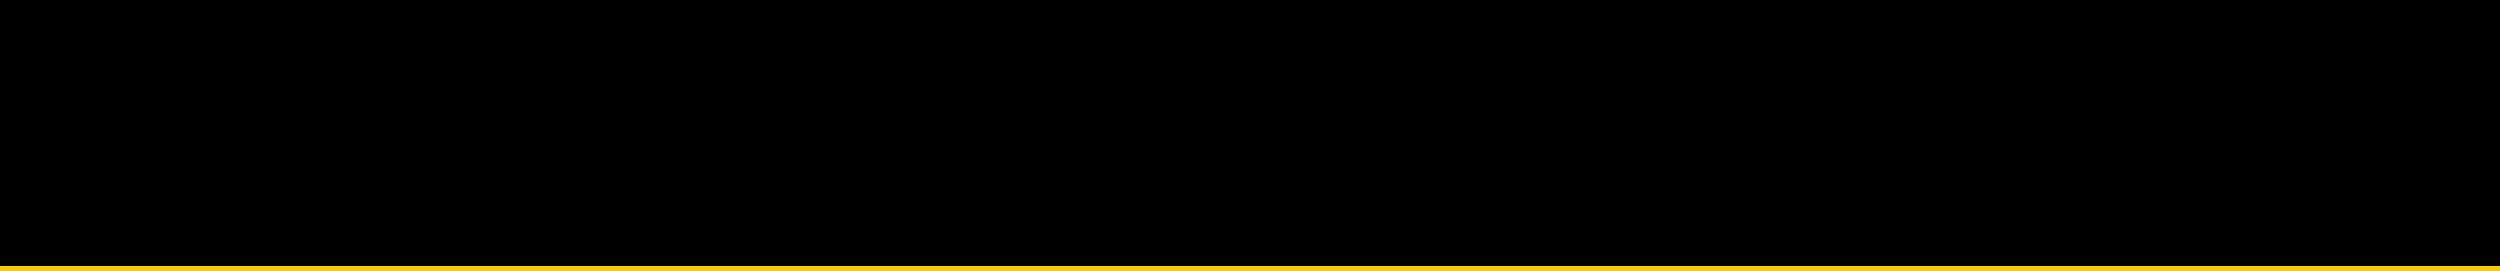 tangier-island-titles4.png